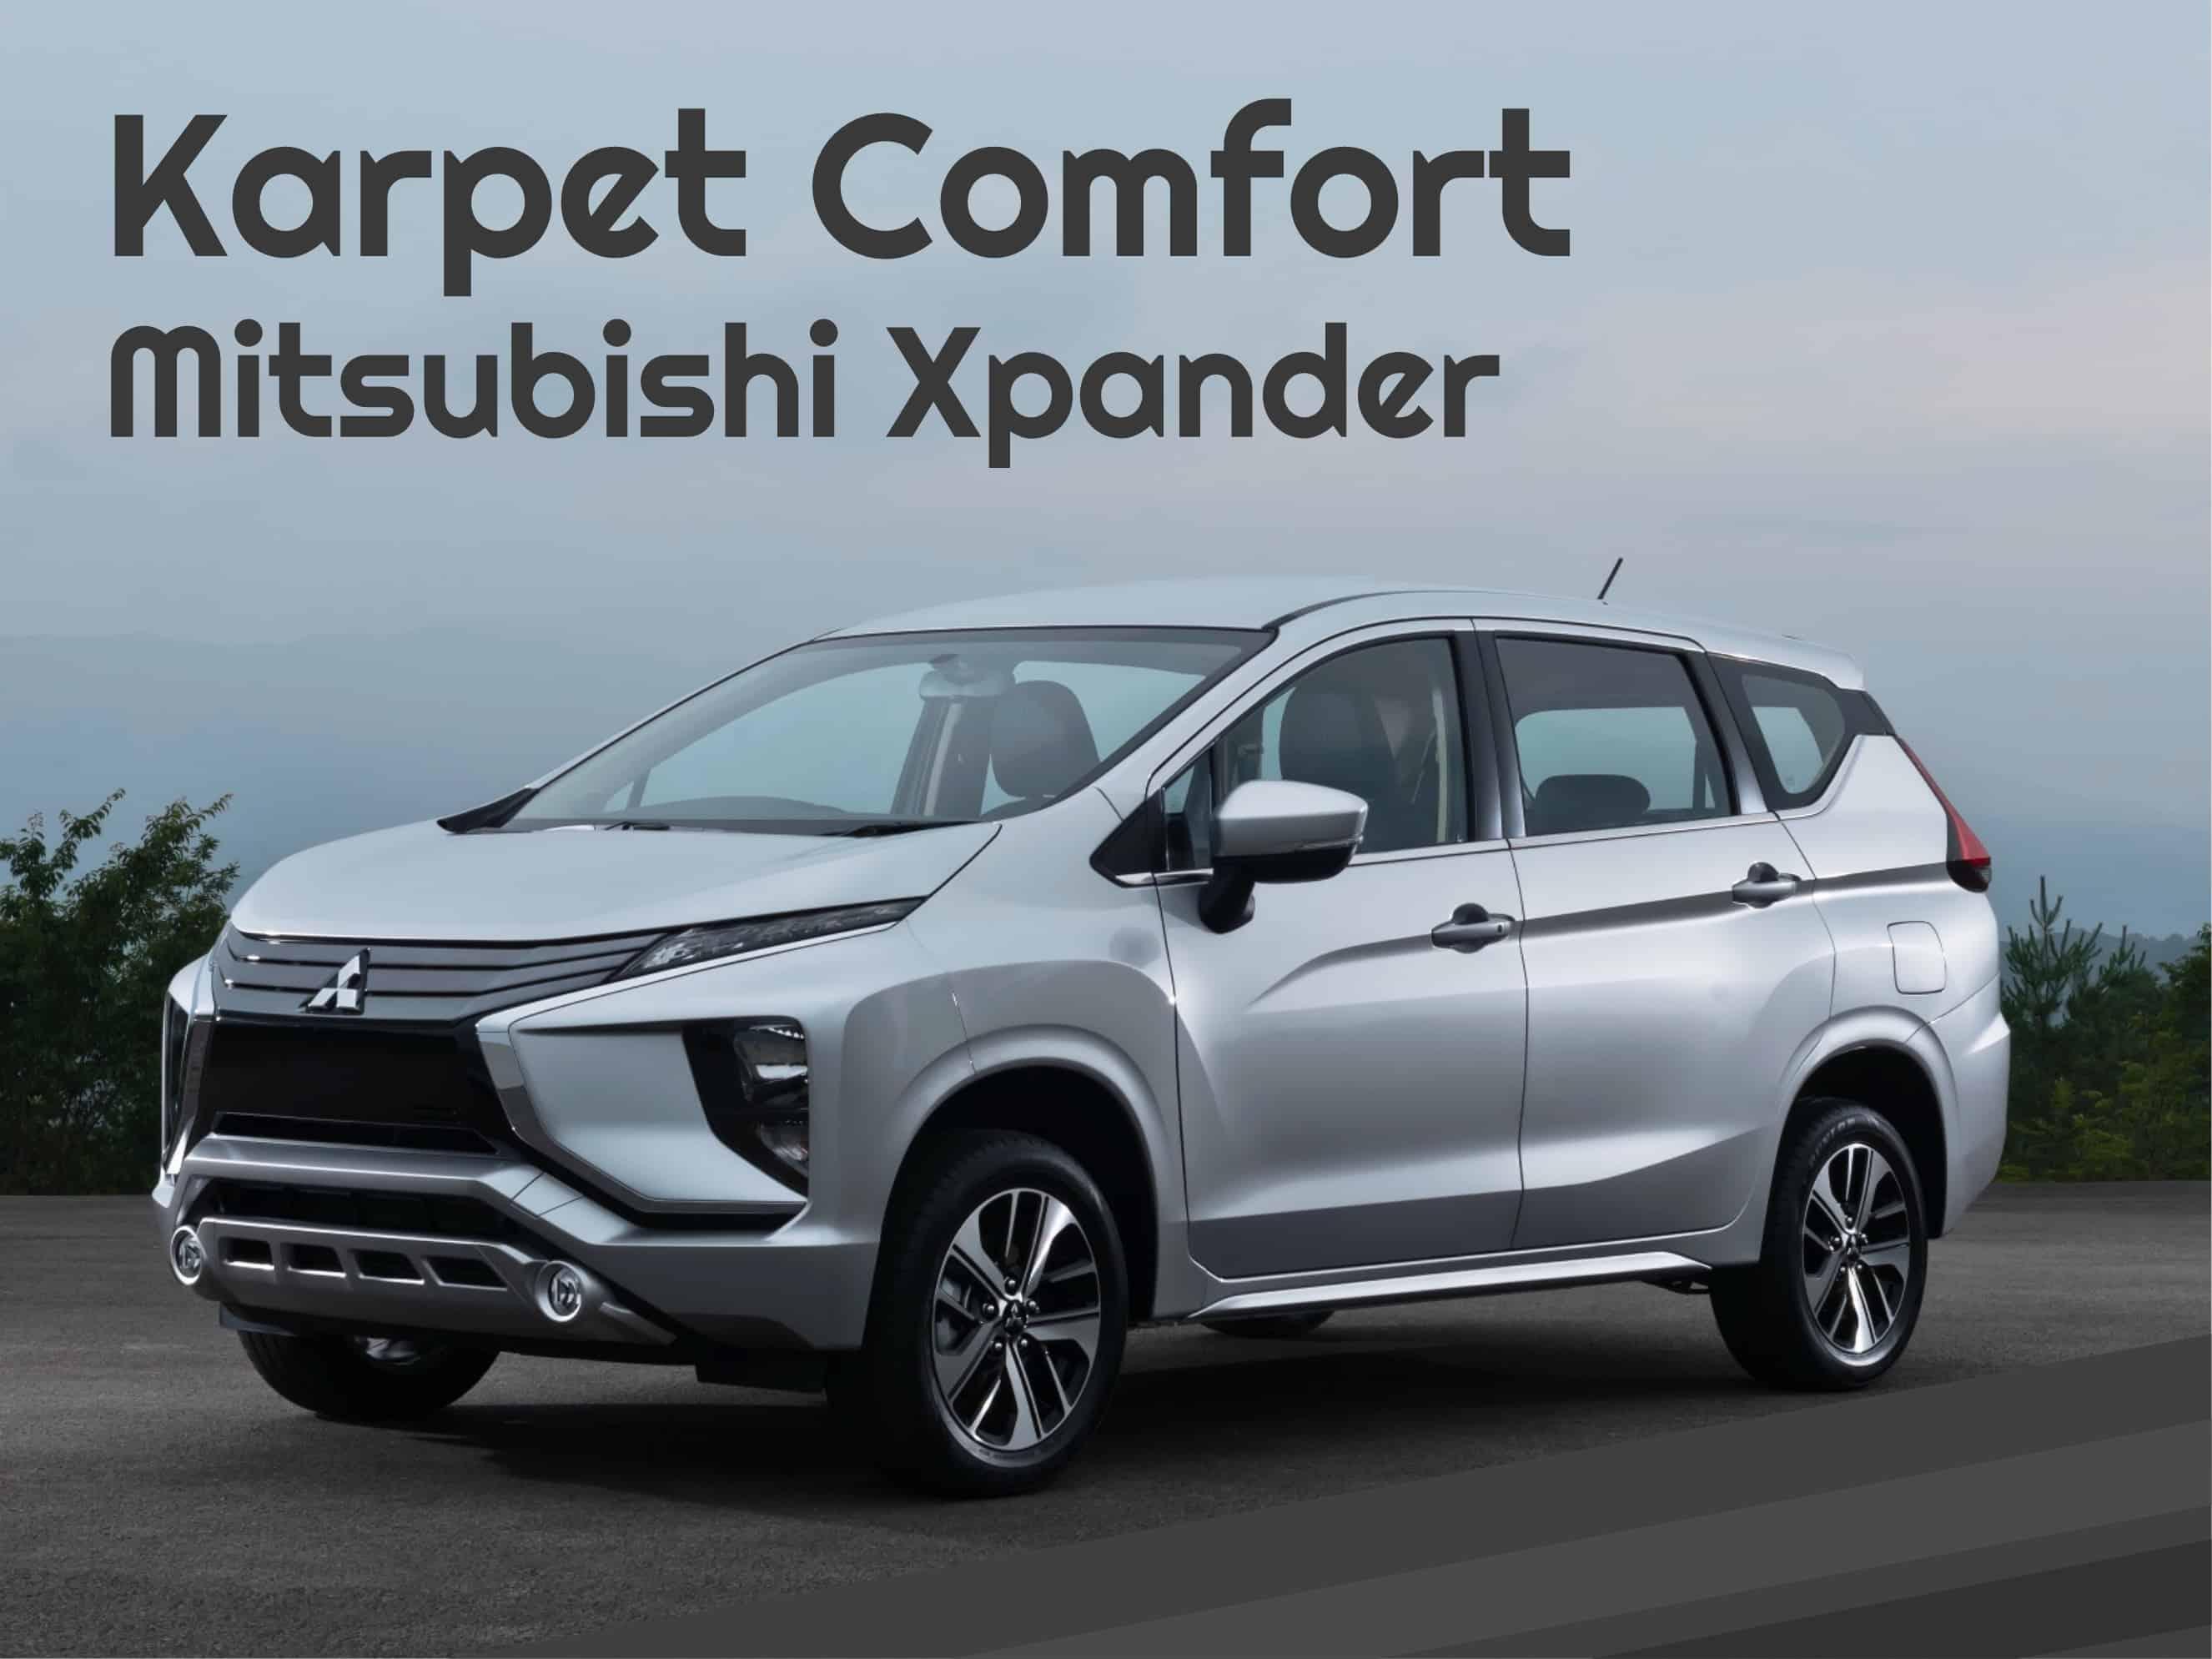 Karpet Comfort untuk Mitsubishi Xpander